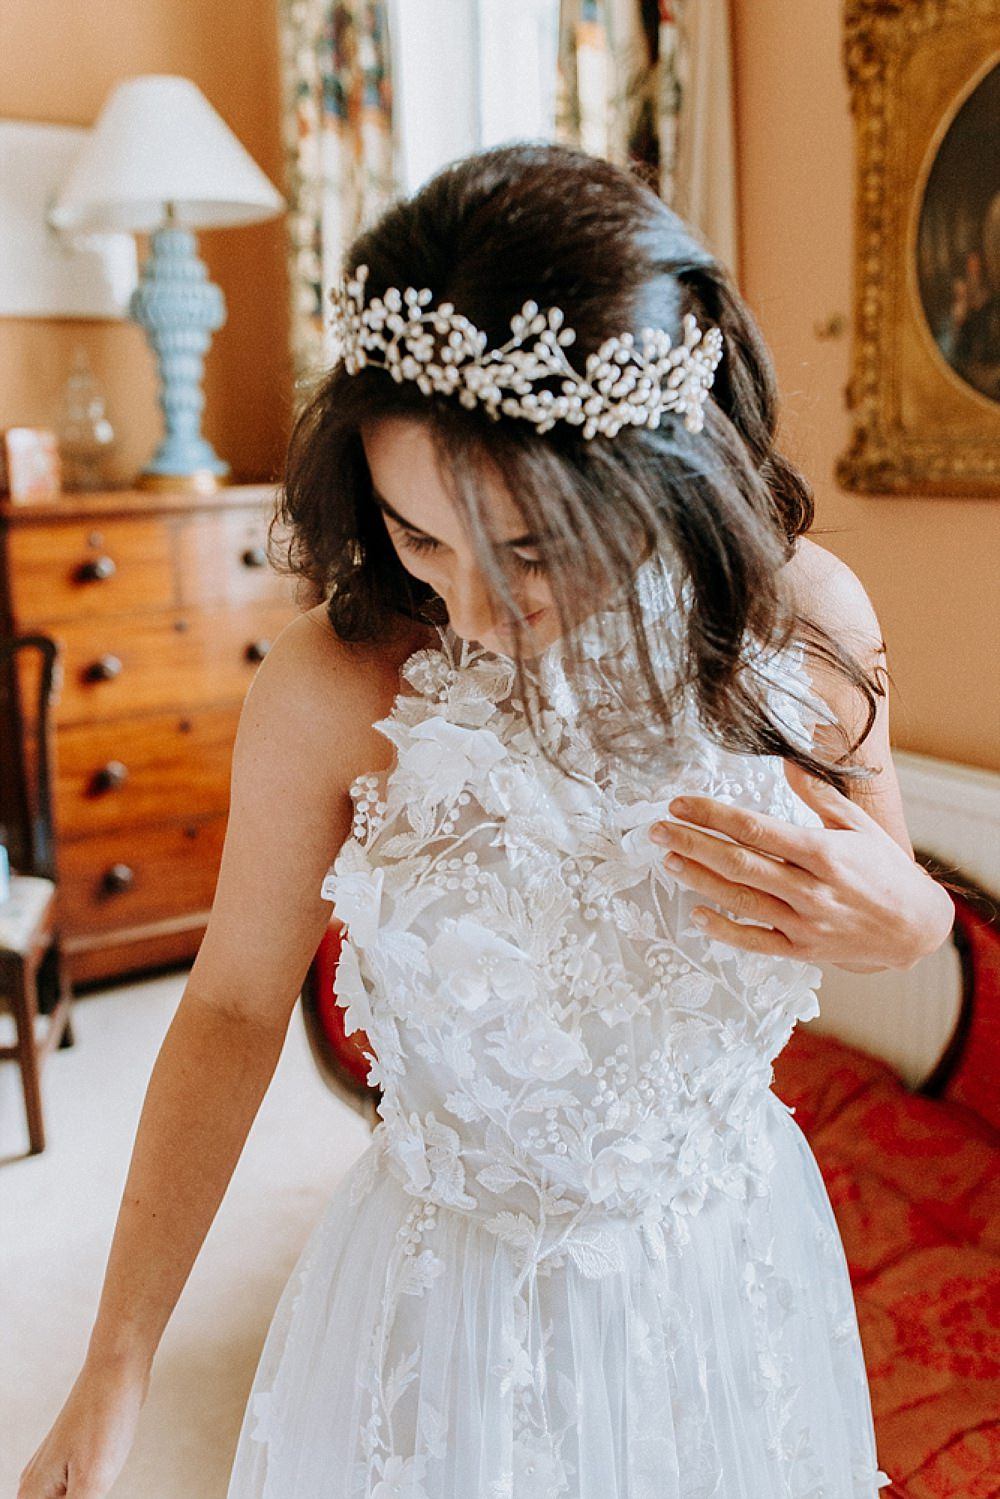 Headpiece Tiara Crown Accessory Bride Bridal Blue Gold Wedding Ideas Ailsa Reeve Photography